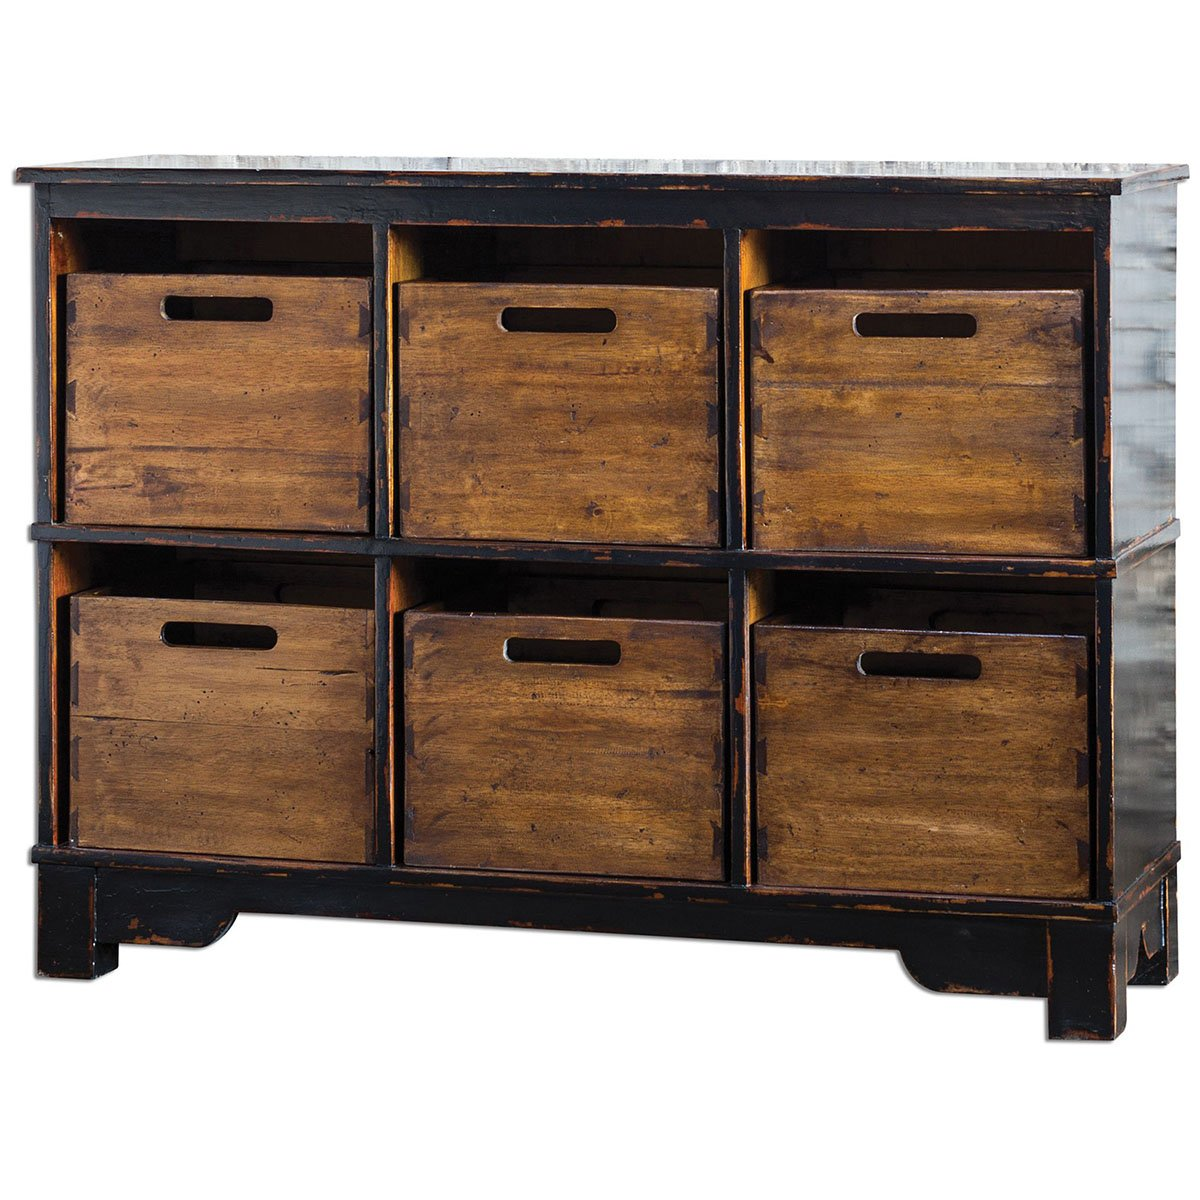 Amazon.com: Uttermost 25589 Ardusin Hobby Cupboard: Kitchen & Dining